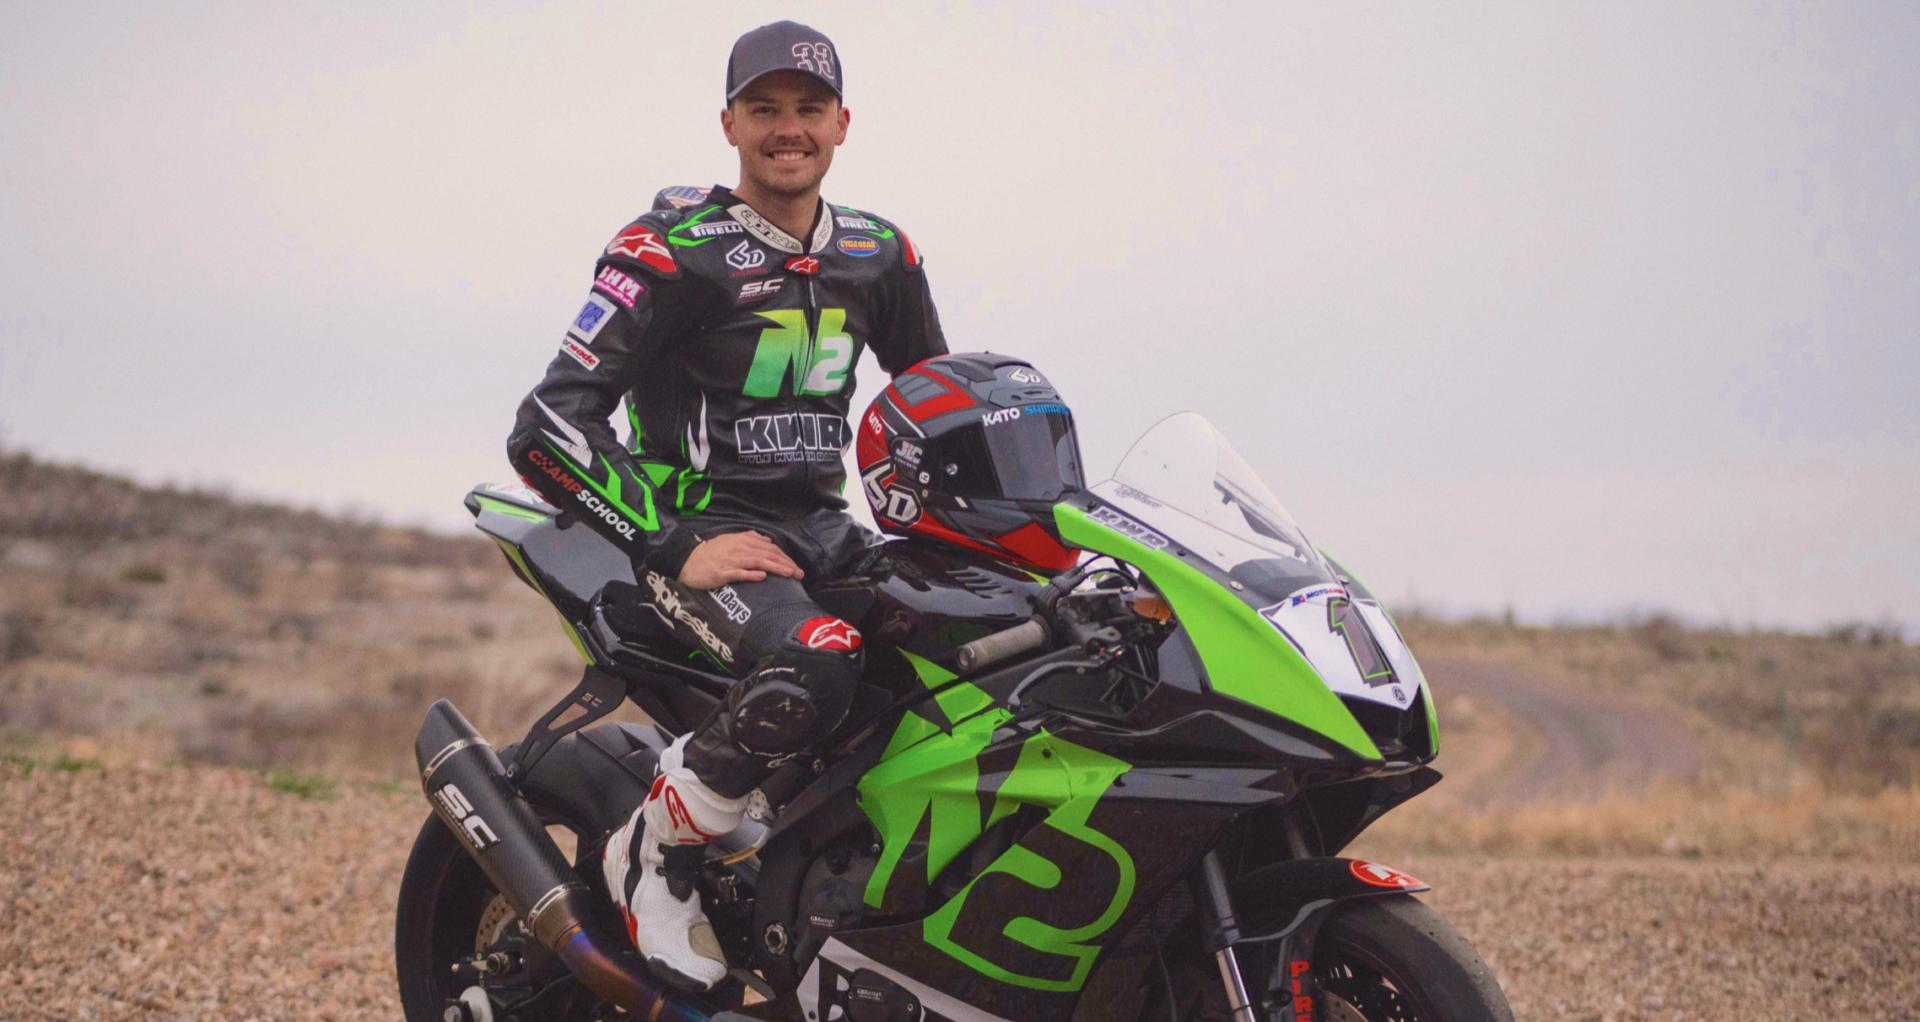 Kyle Wyman, winner of the 2019 Daytona 200. Photo courtesy of N2 Racing.